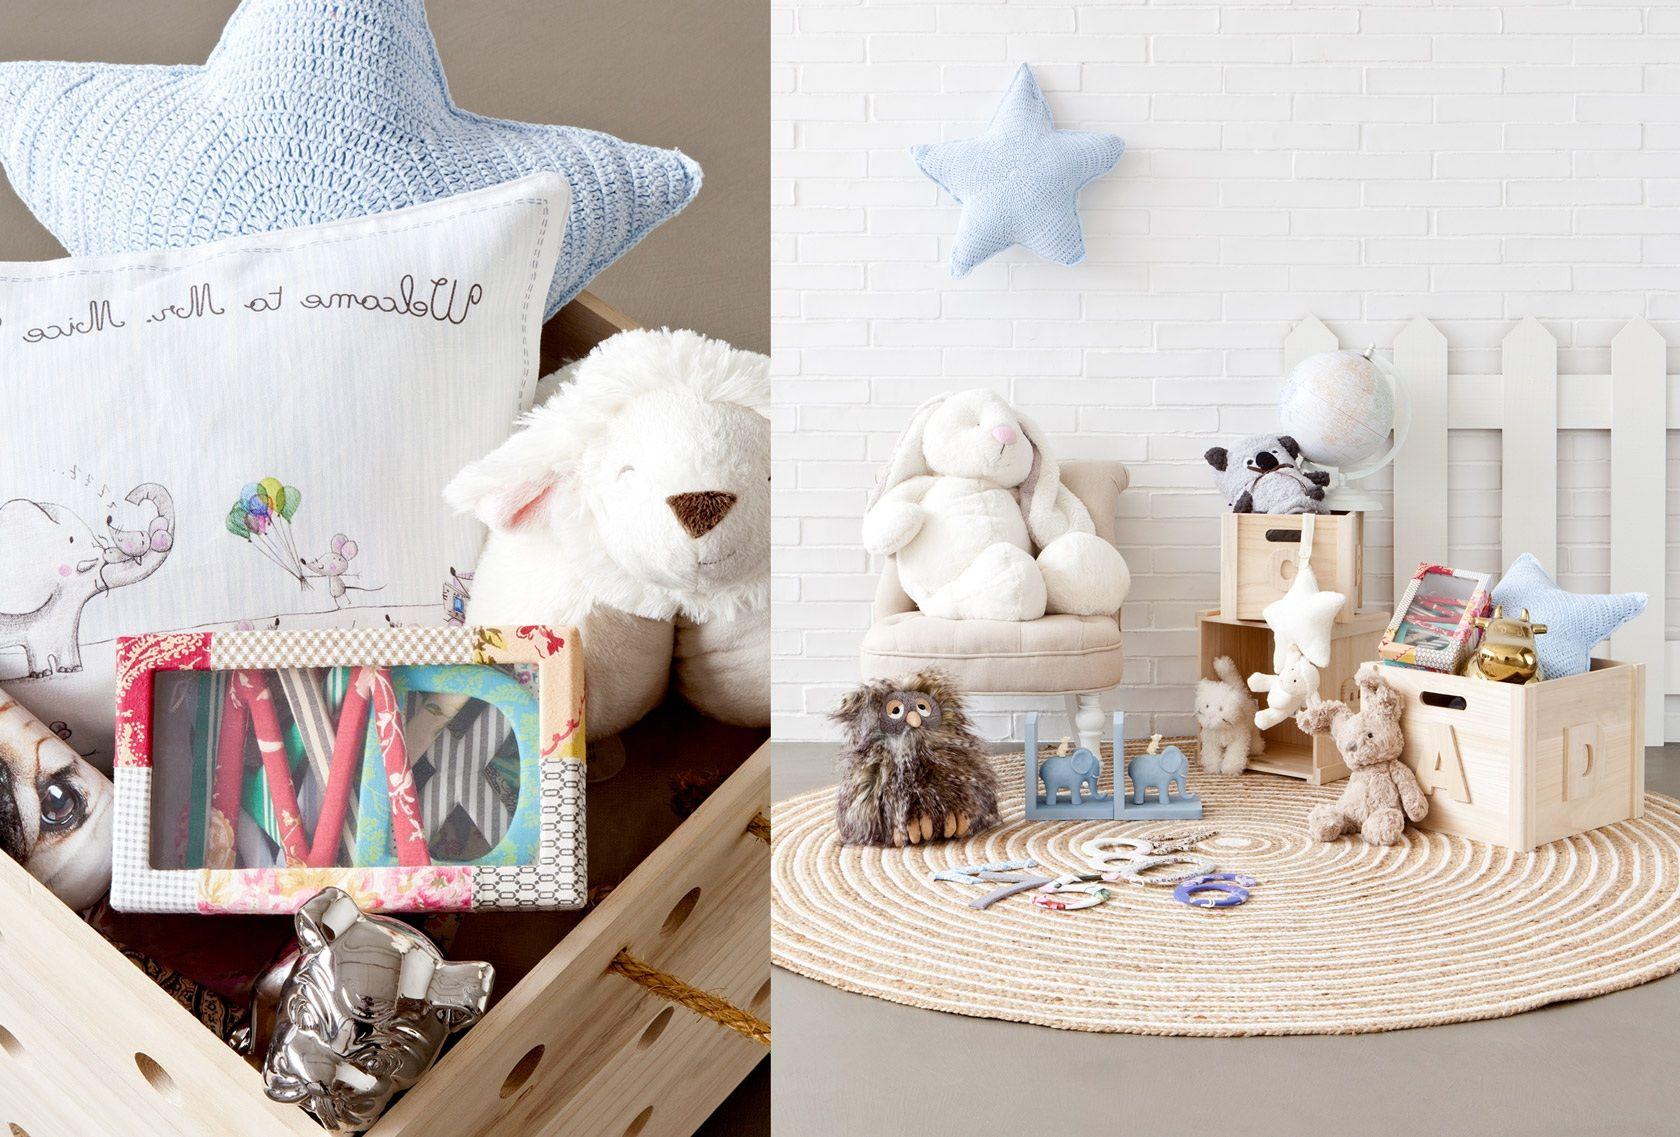 Wondrous Zara Home Kids Kids Room Zara Home Kids Zara Home Baby Download Free Architecture Designs Rallybritishbridgeorg